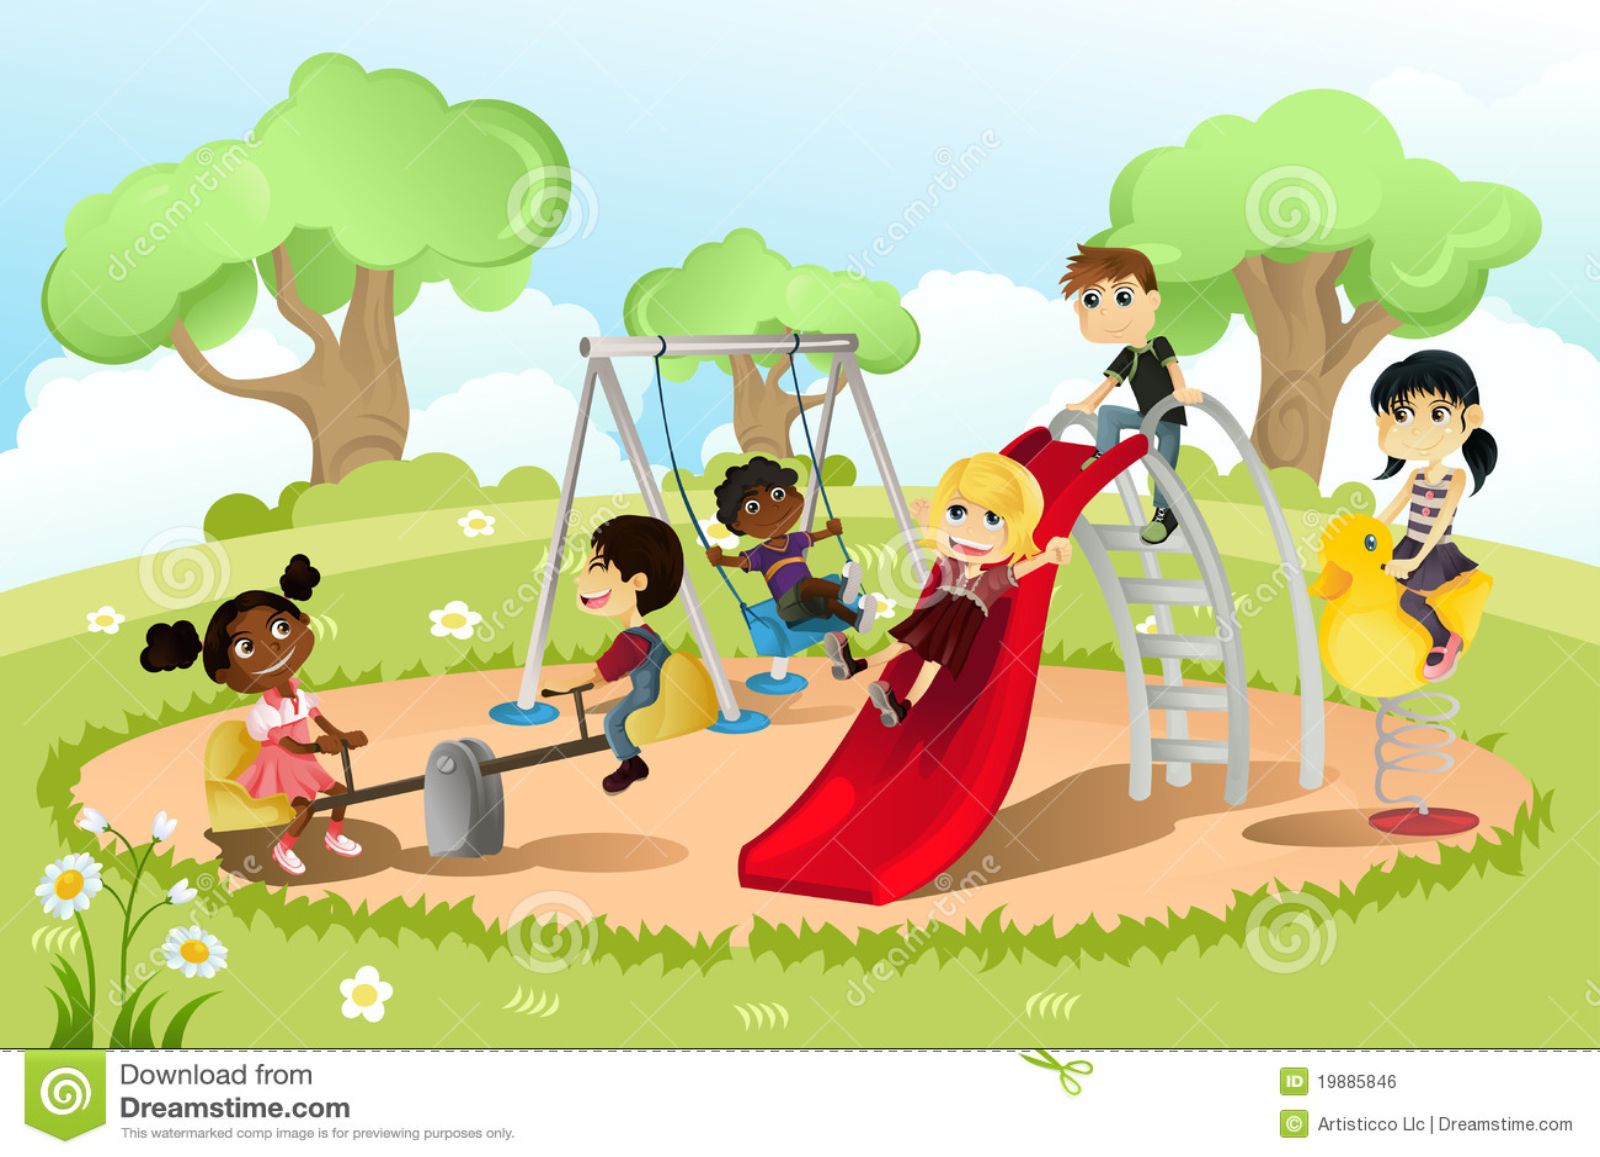 Children in playground royalty free stock image image for Adaptacion jardin infantil